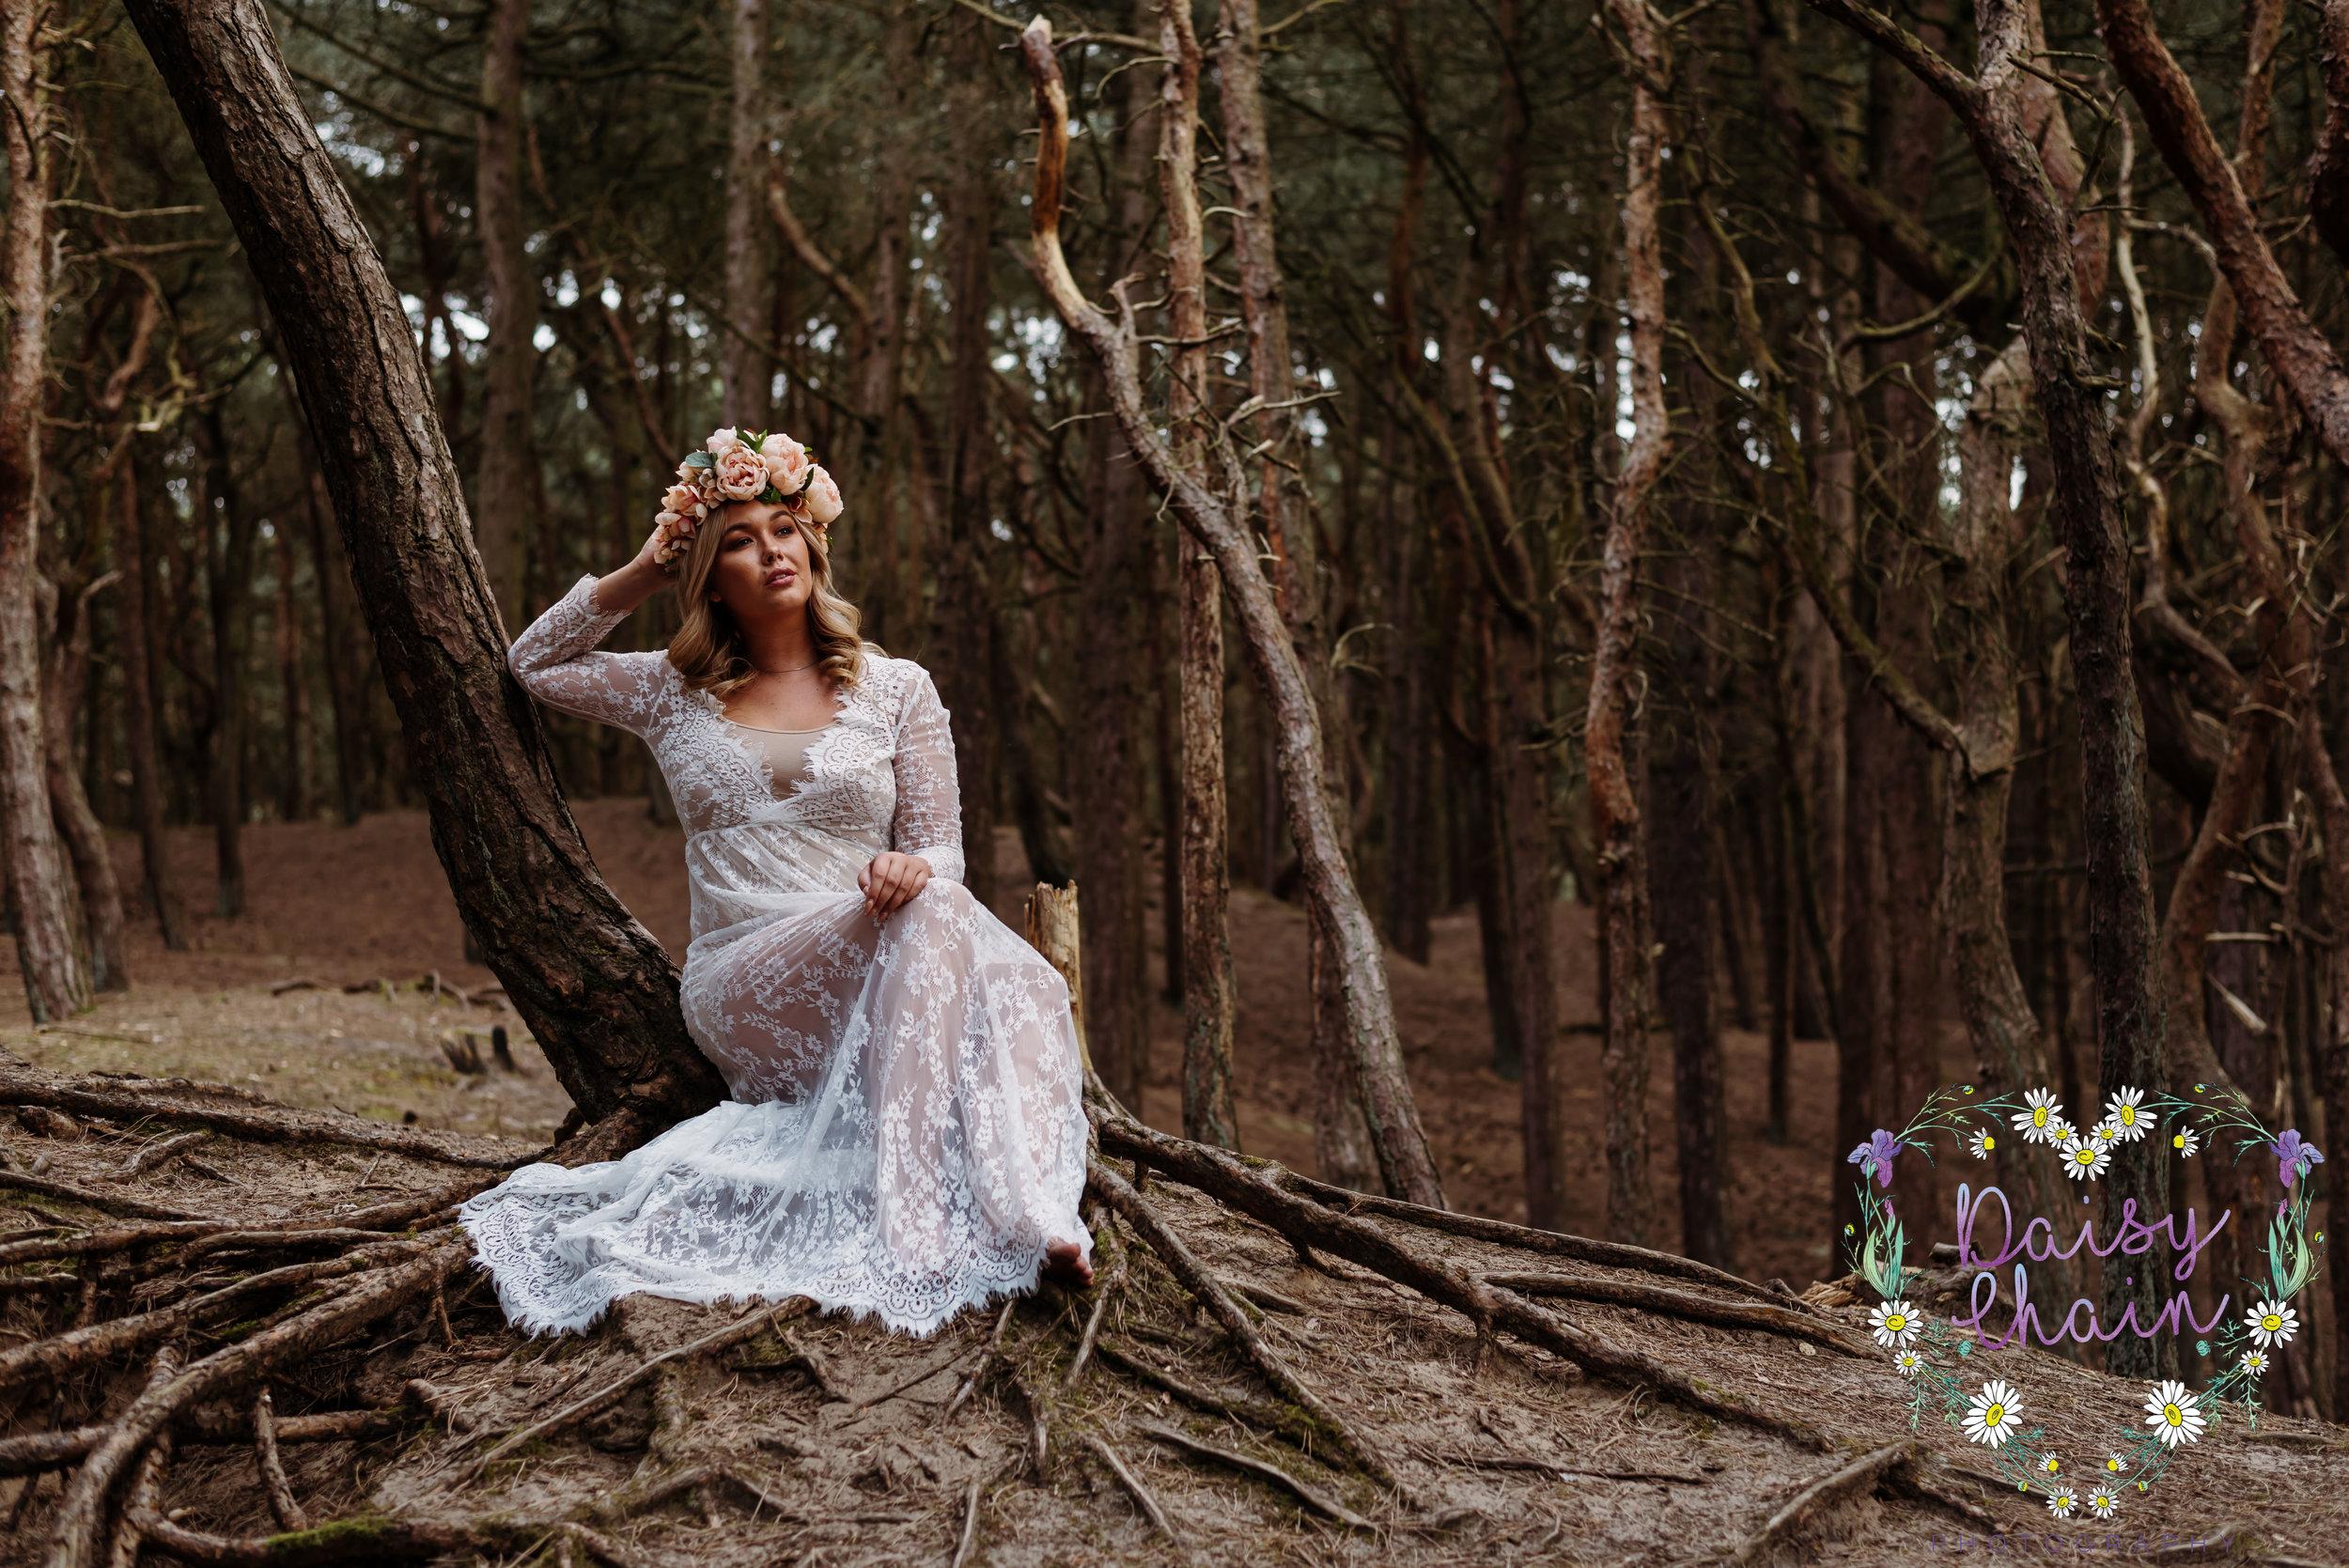 Outdoor wedding - lancashire